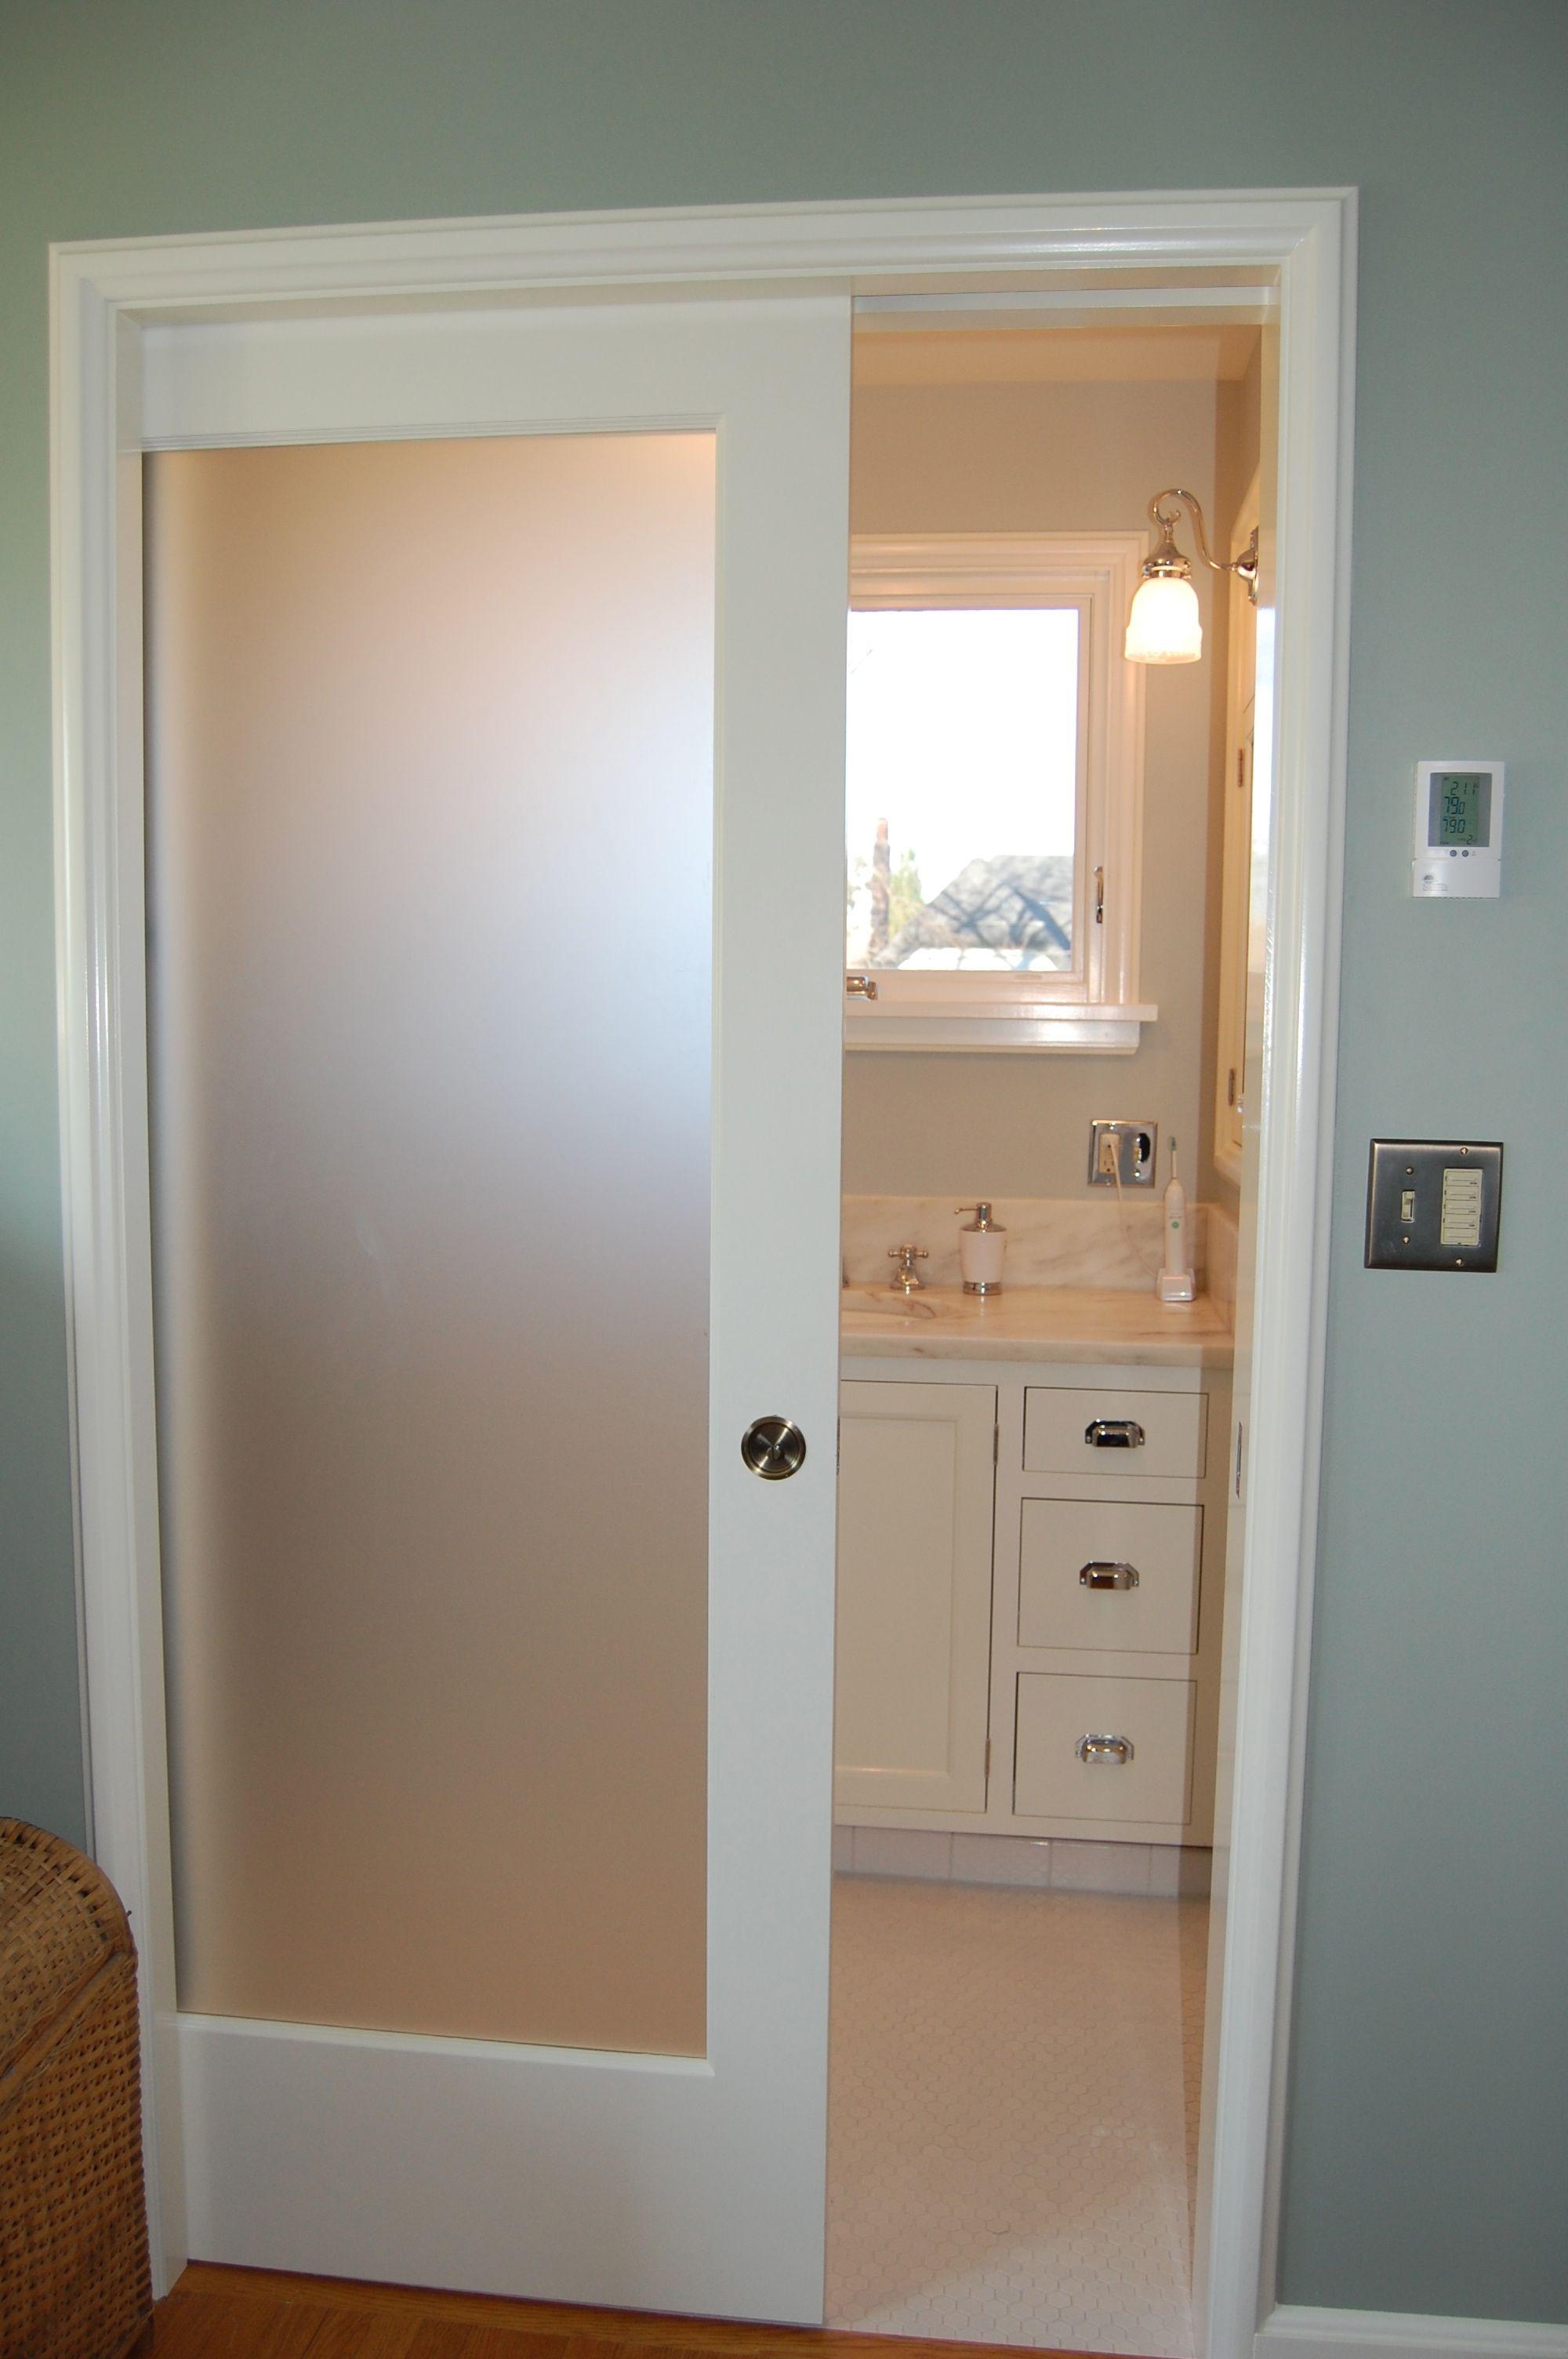 Image Result For Frosted Sliding Pocket Door With Handle Pocket